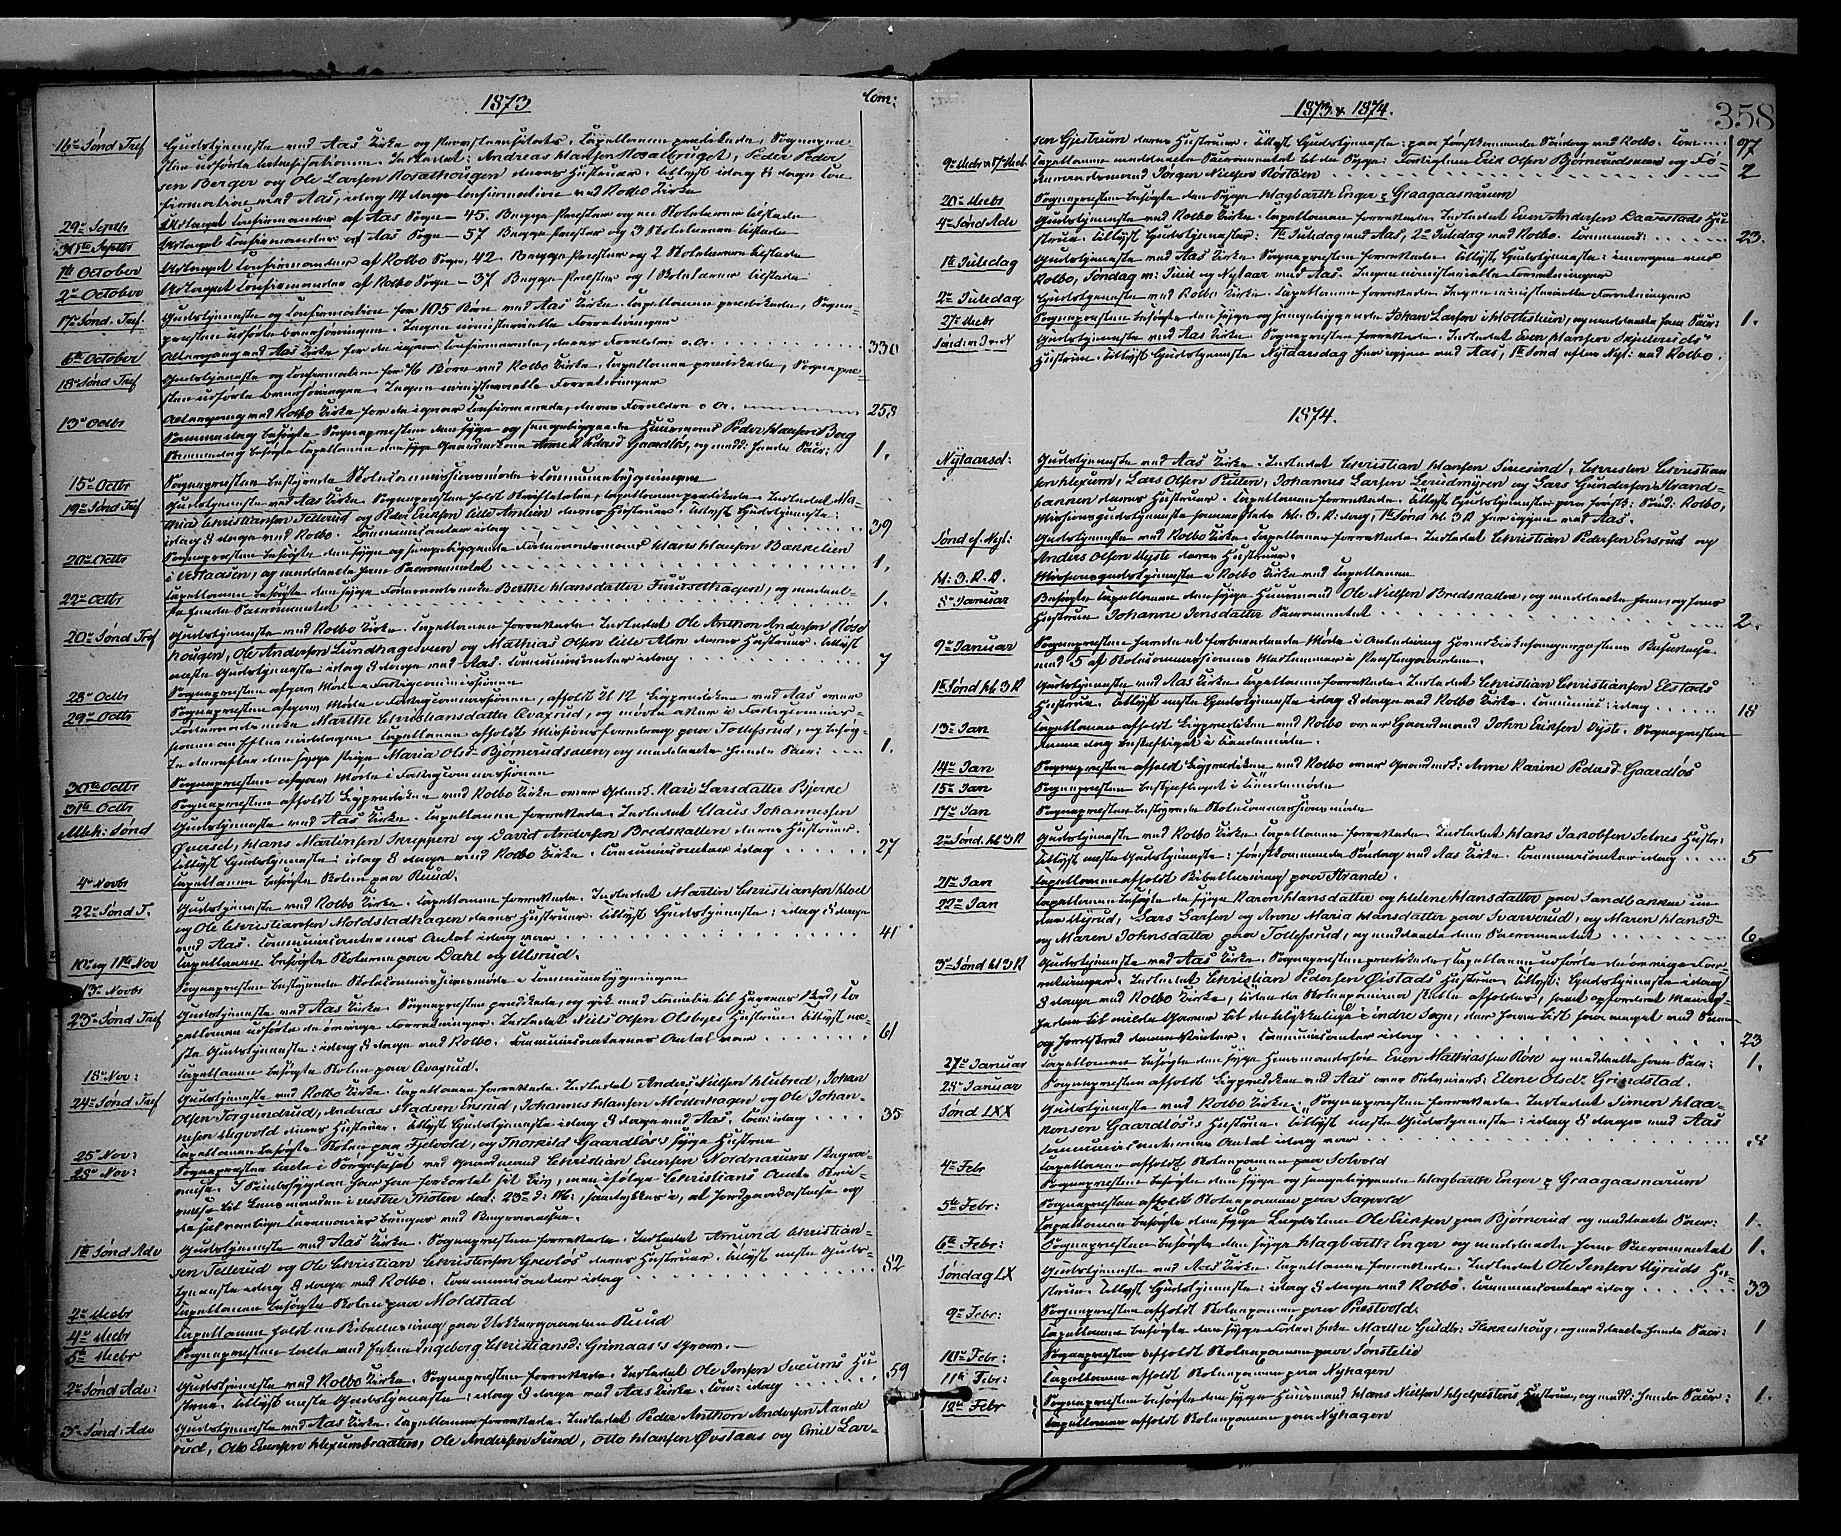 SAH, Vestre Toten prestekontor, H/Ha/Haa/L0008: Ministerialbok nr. 8, 1870-1877, s. 358